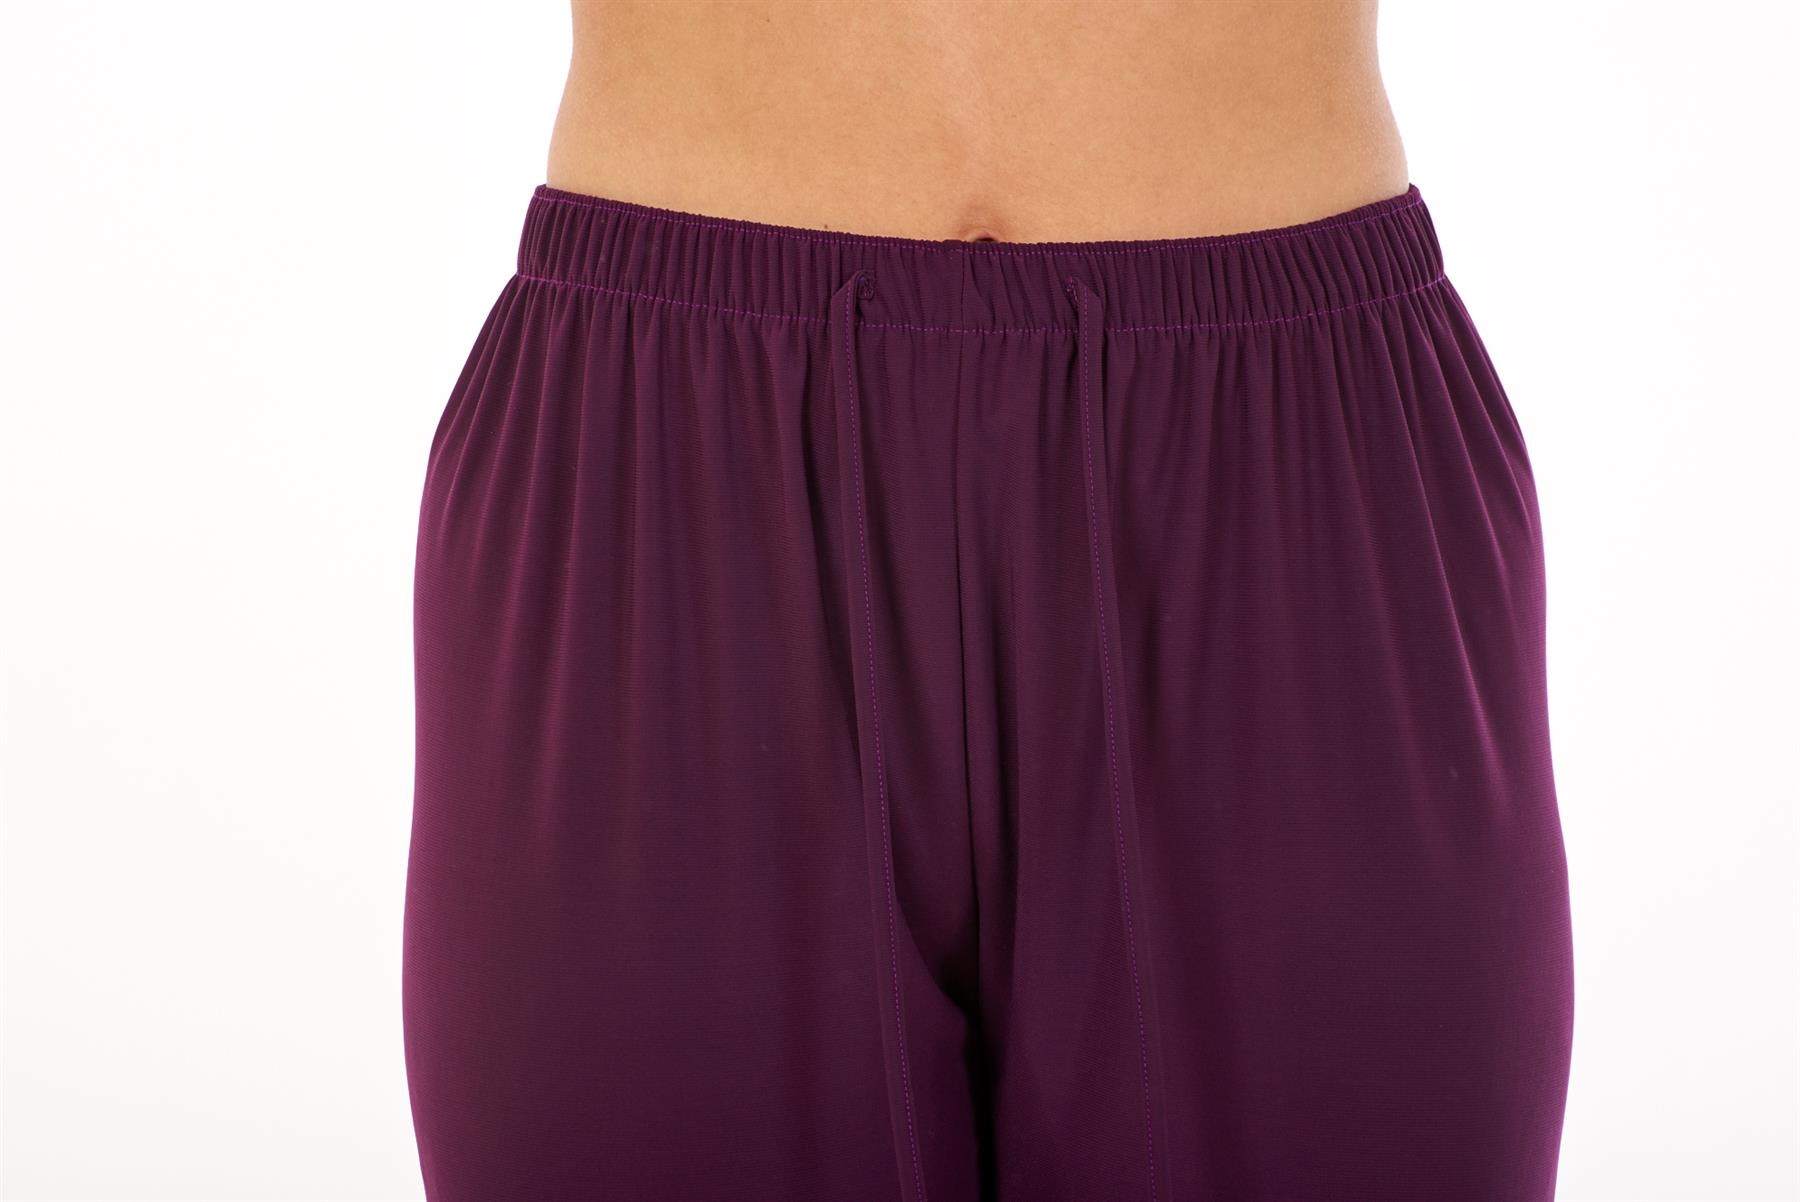 Ladies-Women-Trouser-Elasticated-Tapered-High-waist-ITY-Regular-Pants-Black thumbnail 33